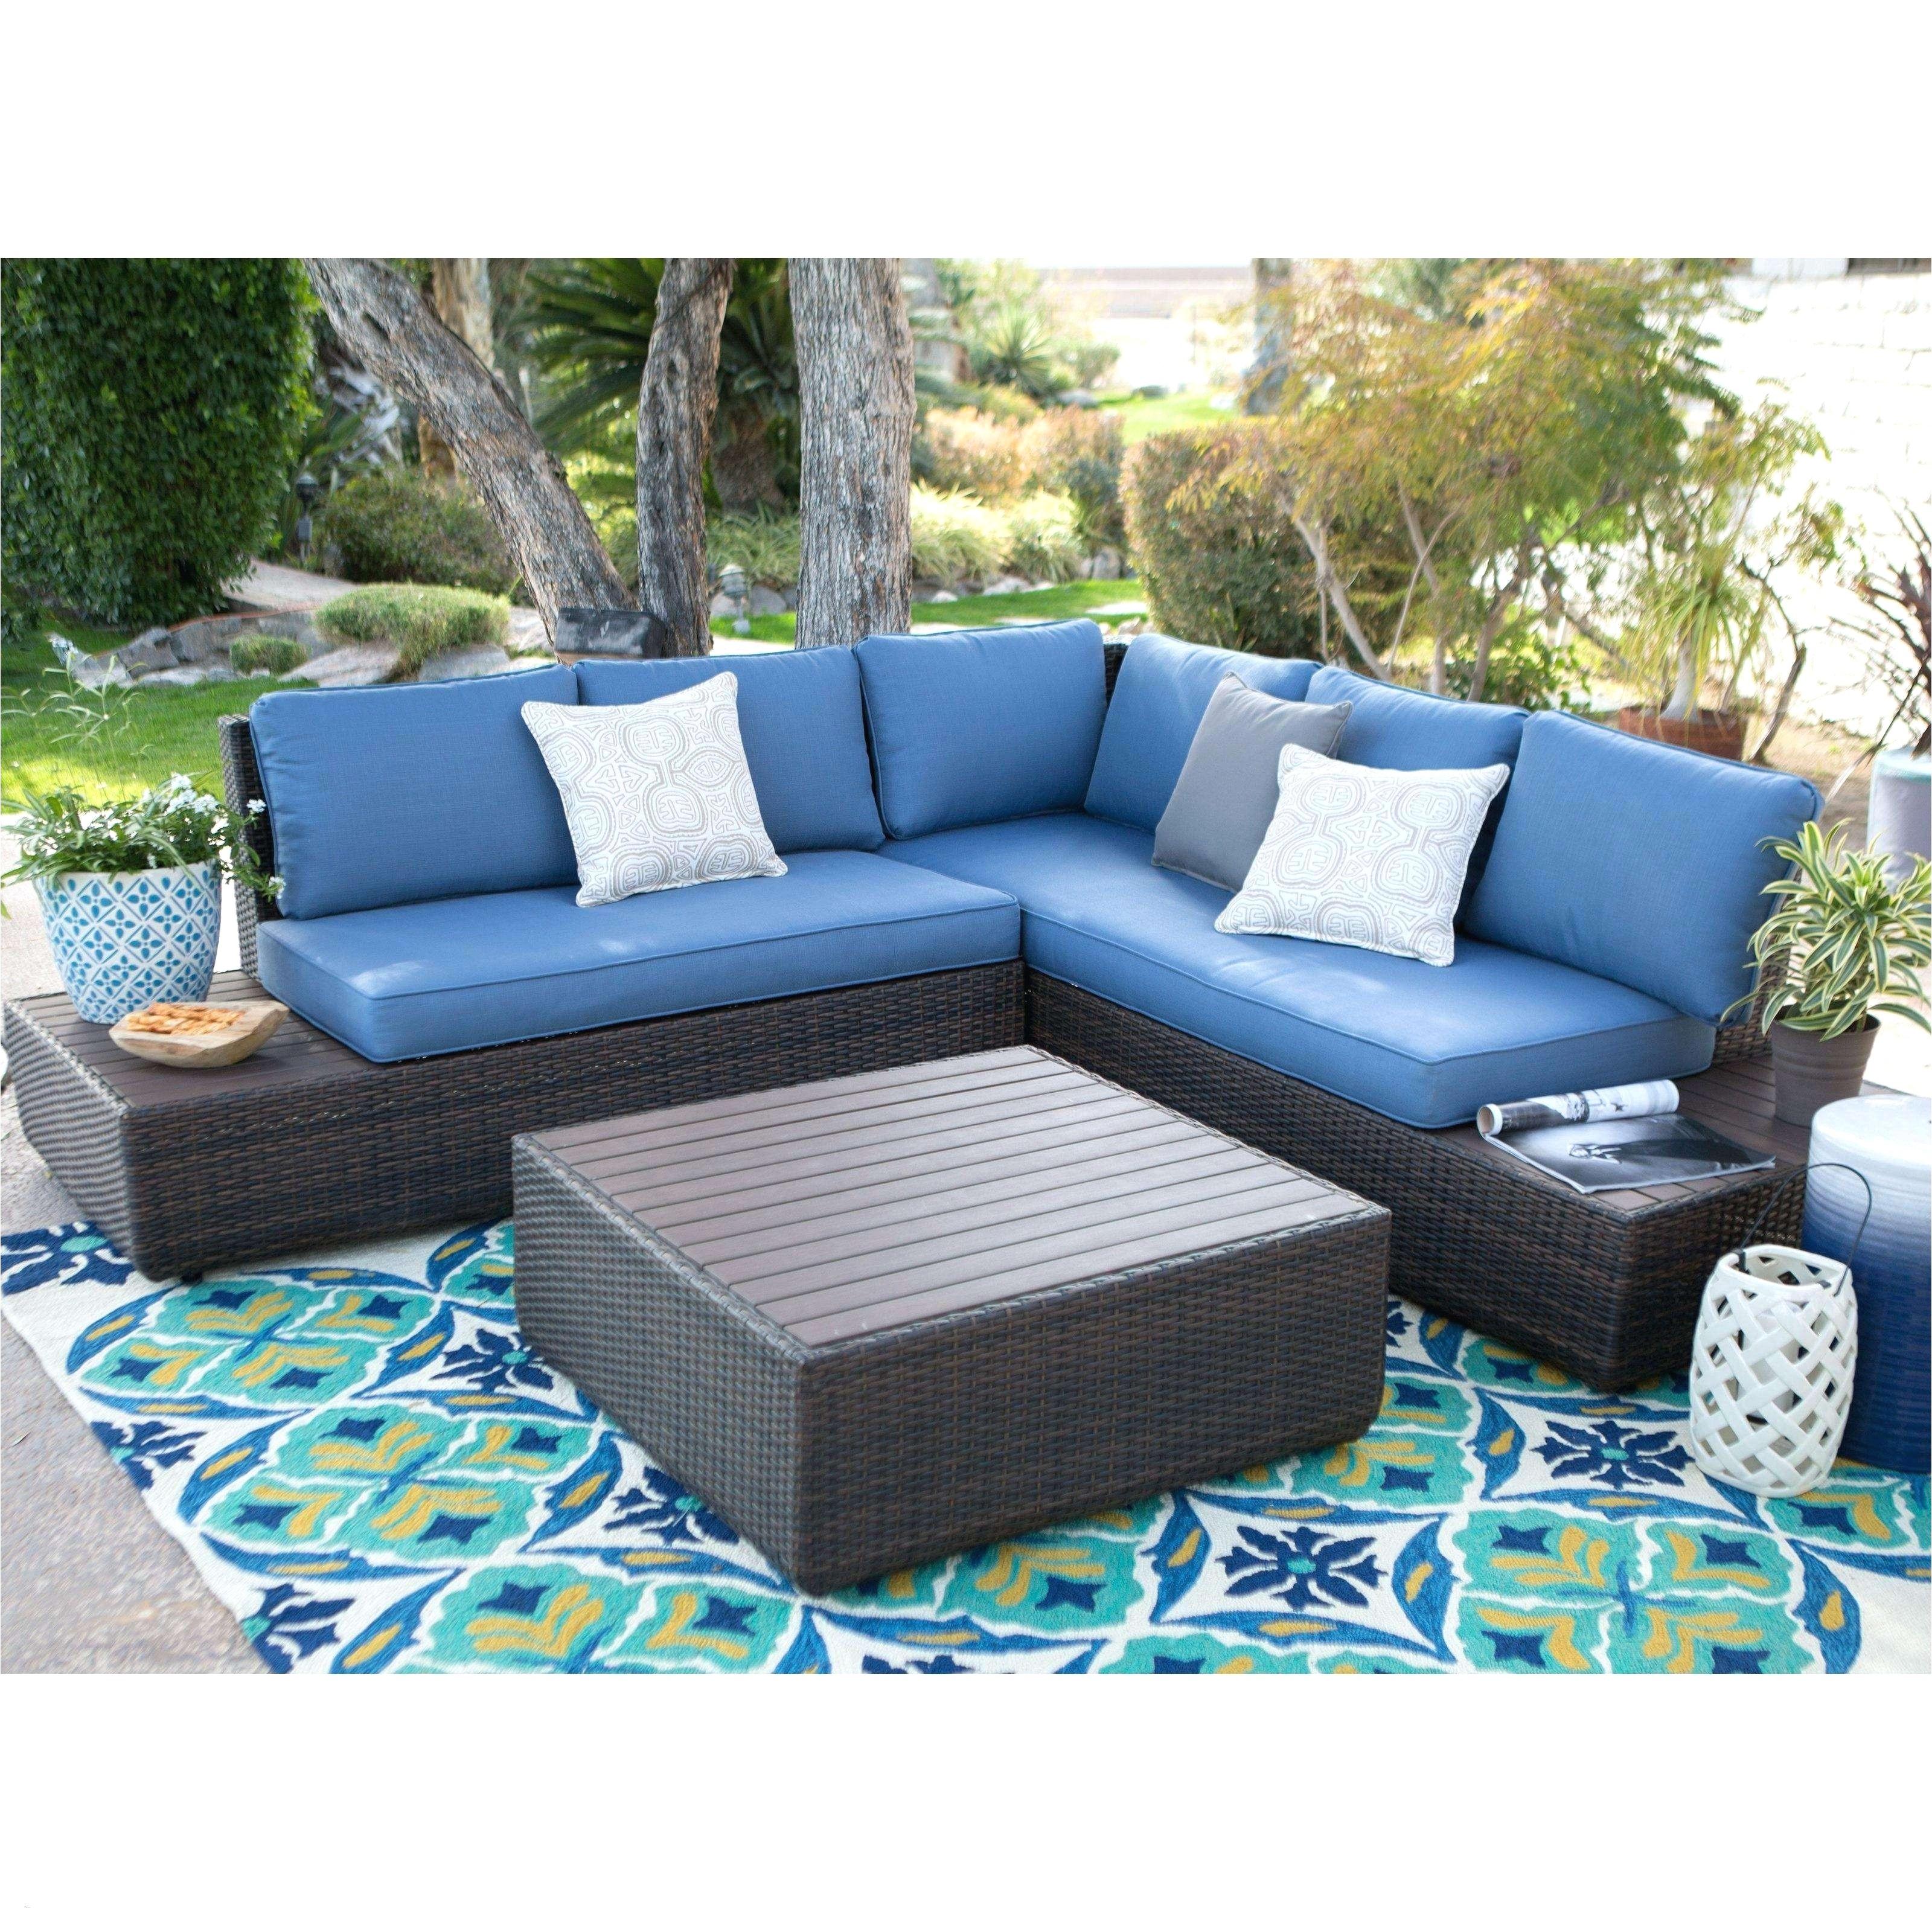 kids outdoor furniture luxury 24 inspirational outdoor furniture atlanta awesome best furniture